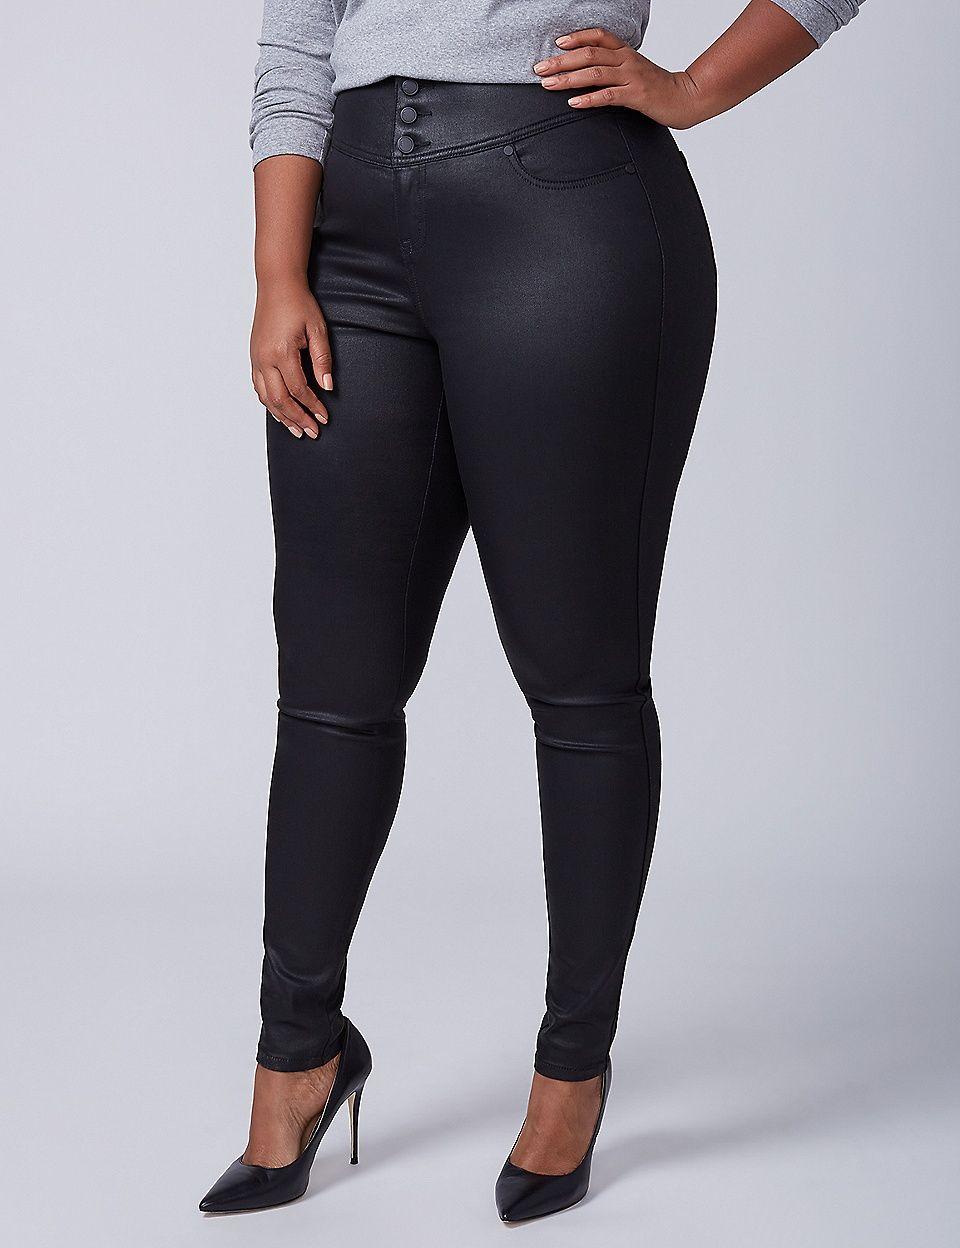 33acb9b0426 High-Rise Super Stretch Skinny Jean - Coated